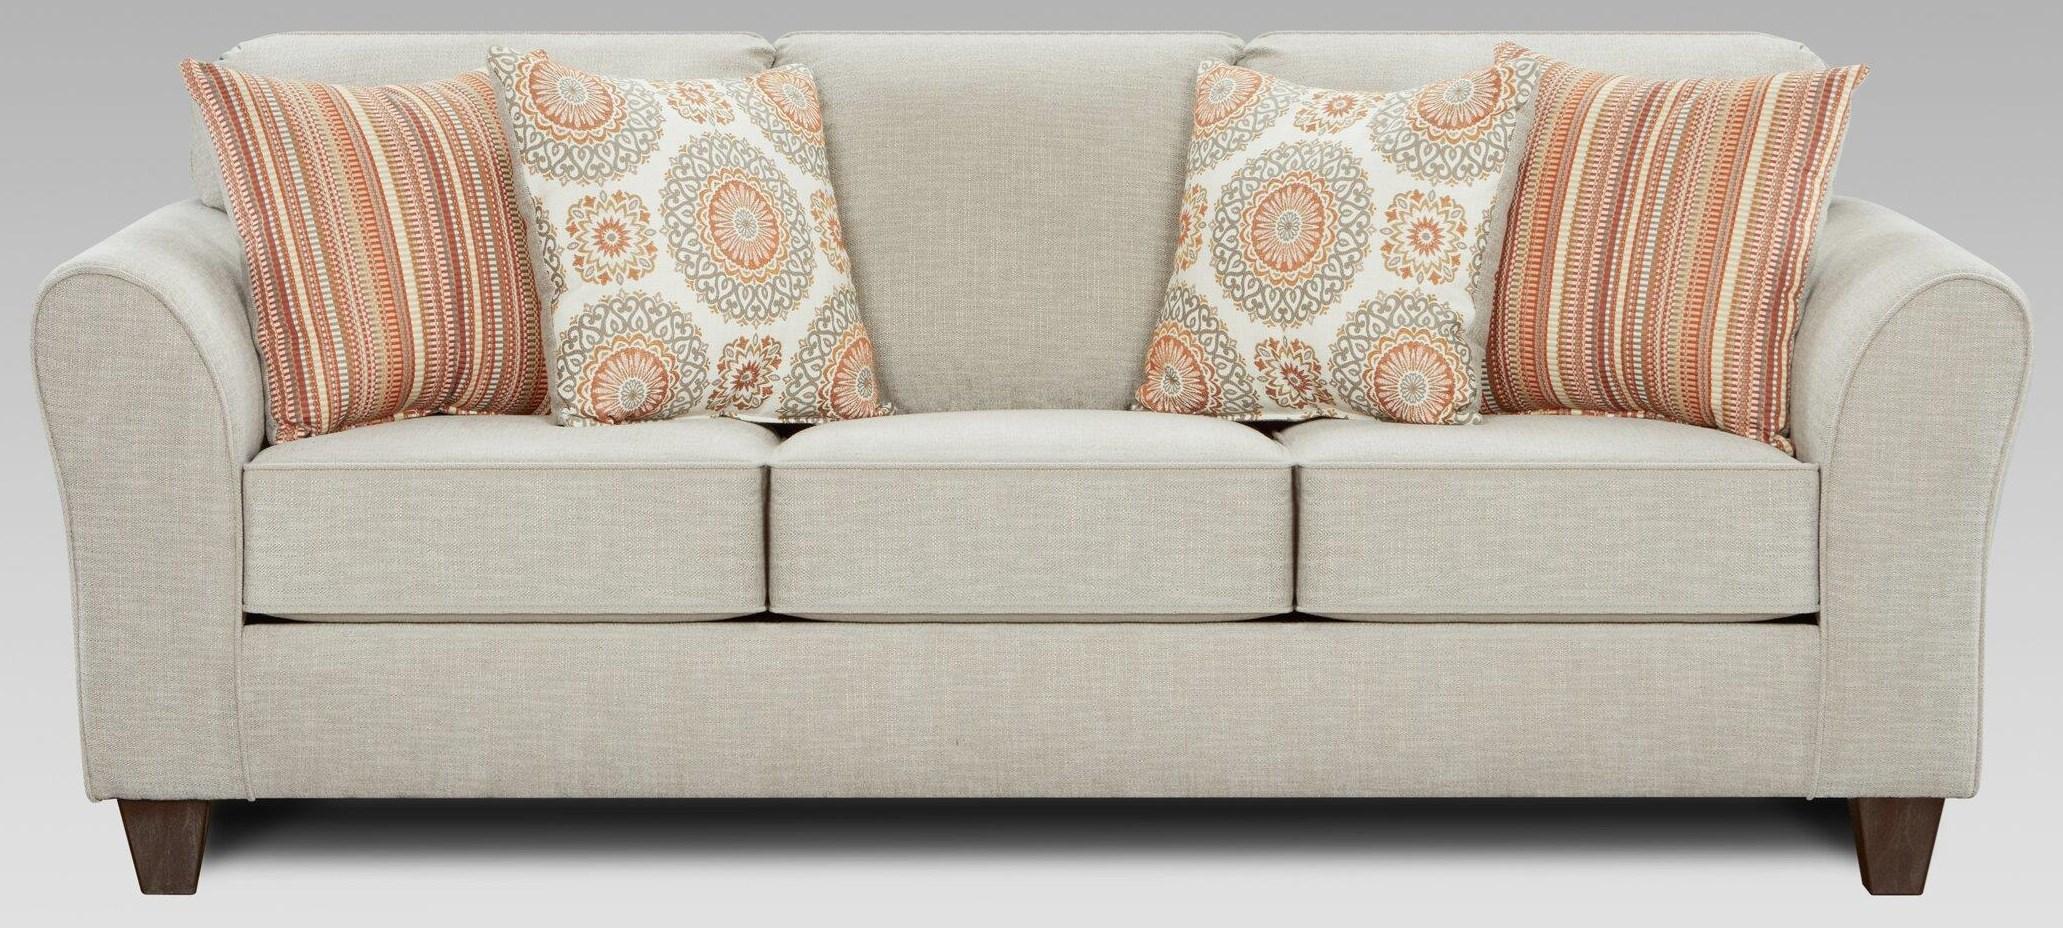 5040 Bennington Taupe Sofa at Bennett's Furniture and Mattresses